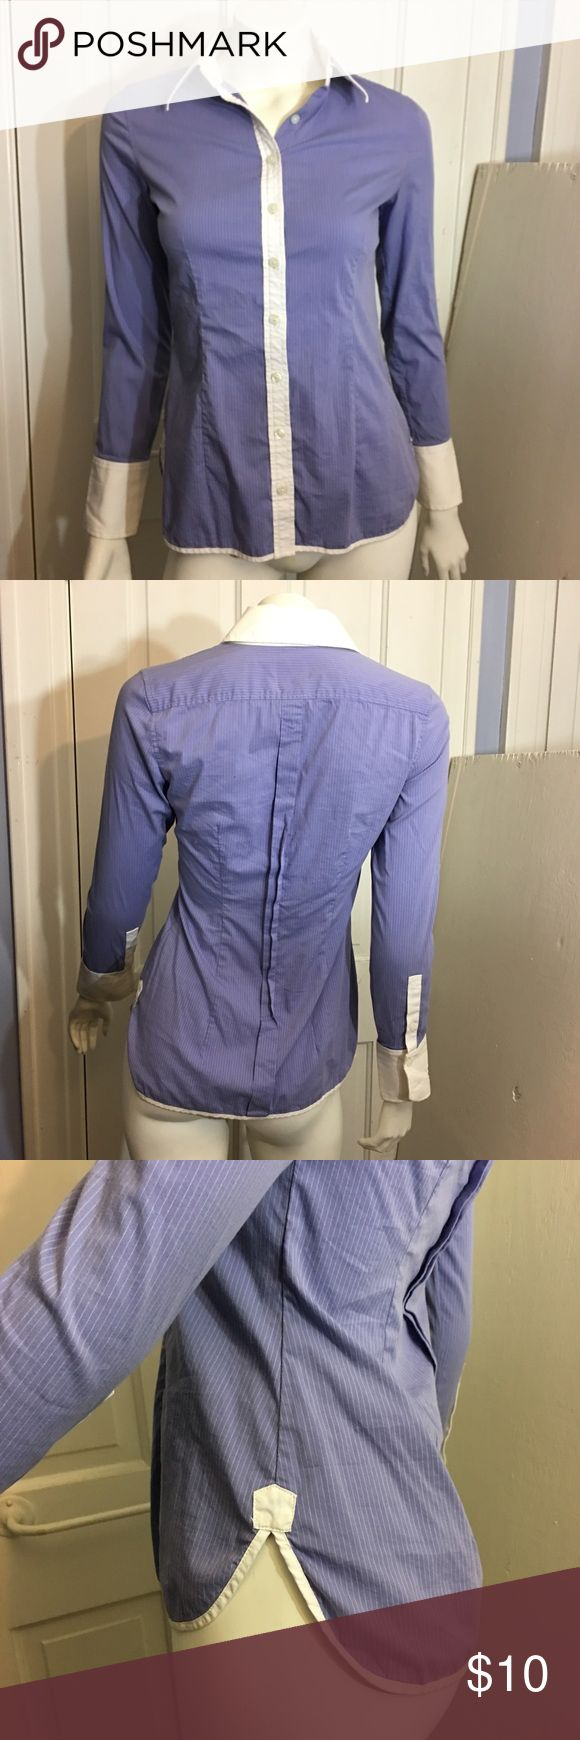 Express design studio button down shirt Express design studio button down shirt, in great pre-owned condition. Express design studio Tops Button Down Shirts